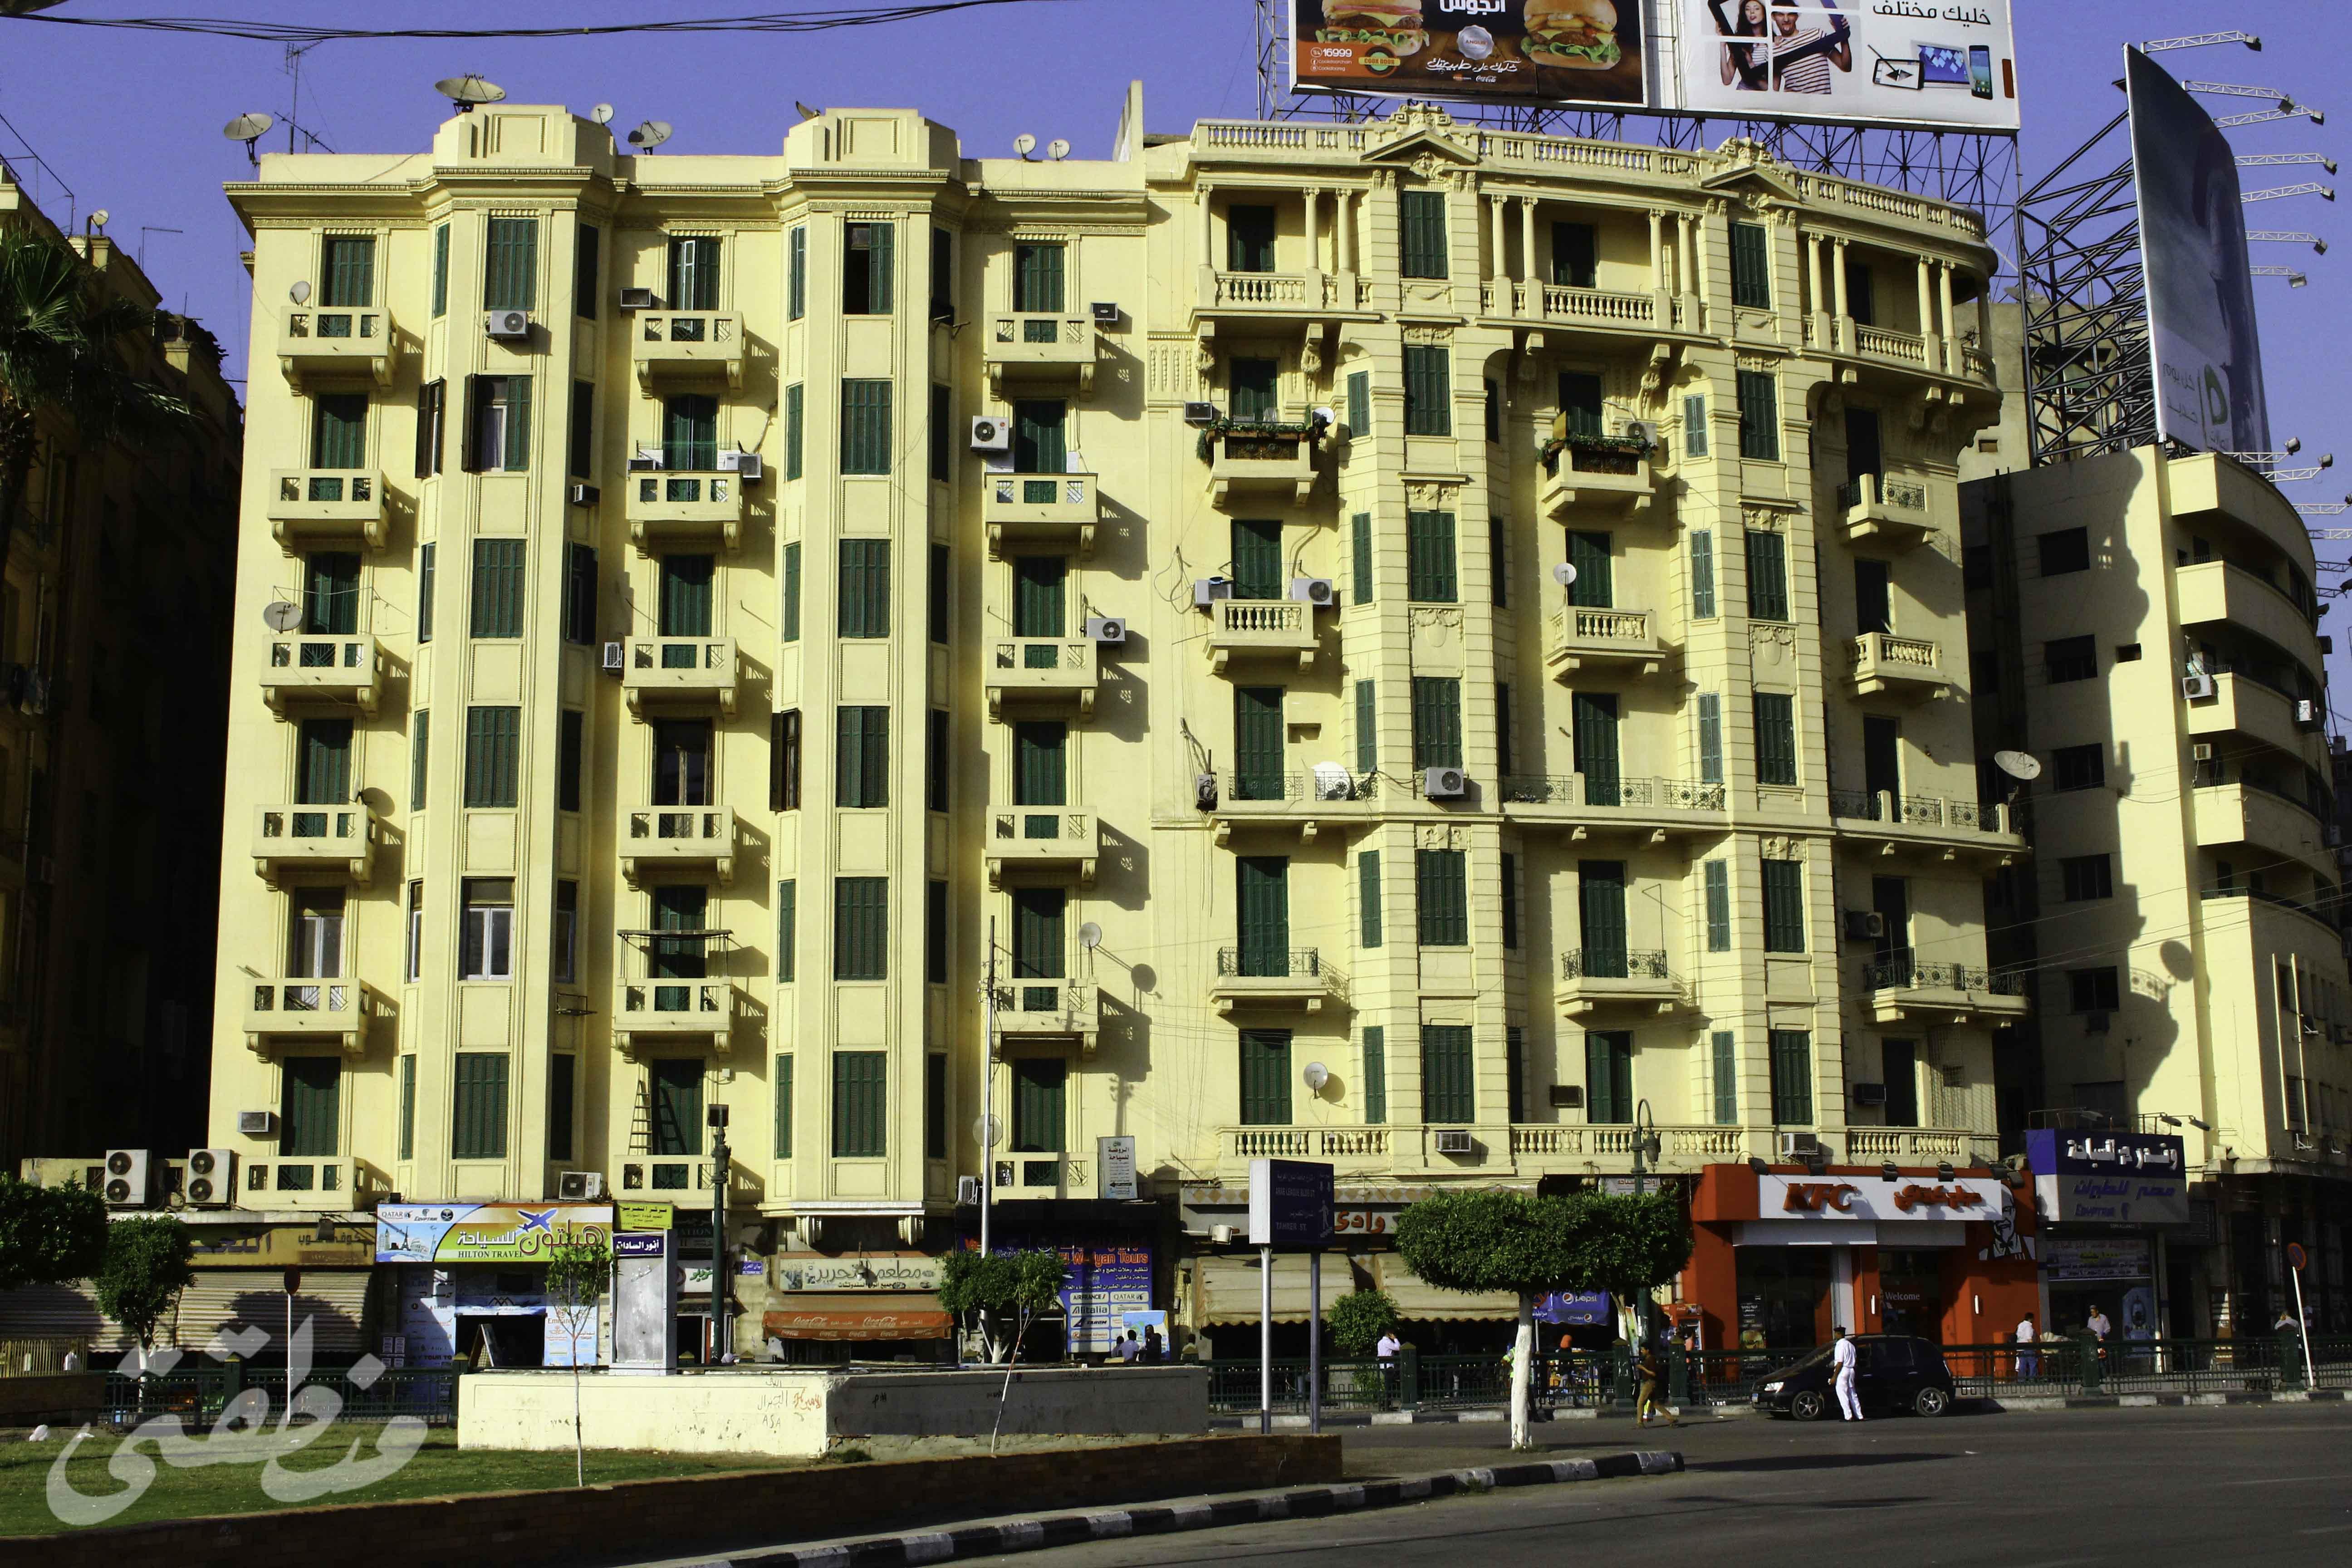 عمارتين يونانيتين في ميدان التحرير - تصوير: صديق البخشونجي